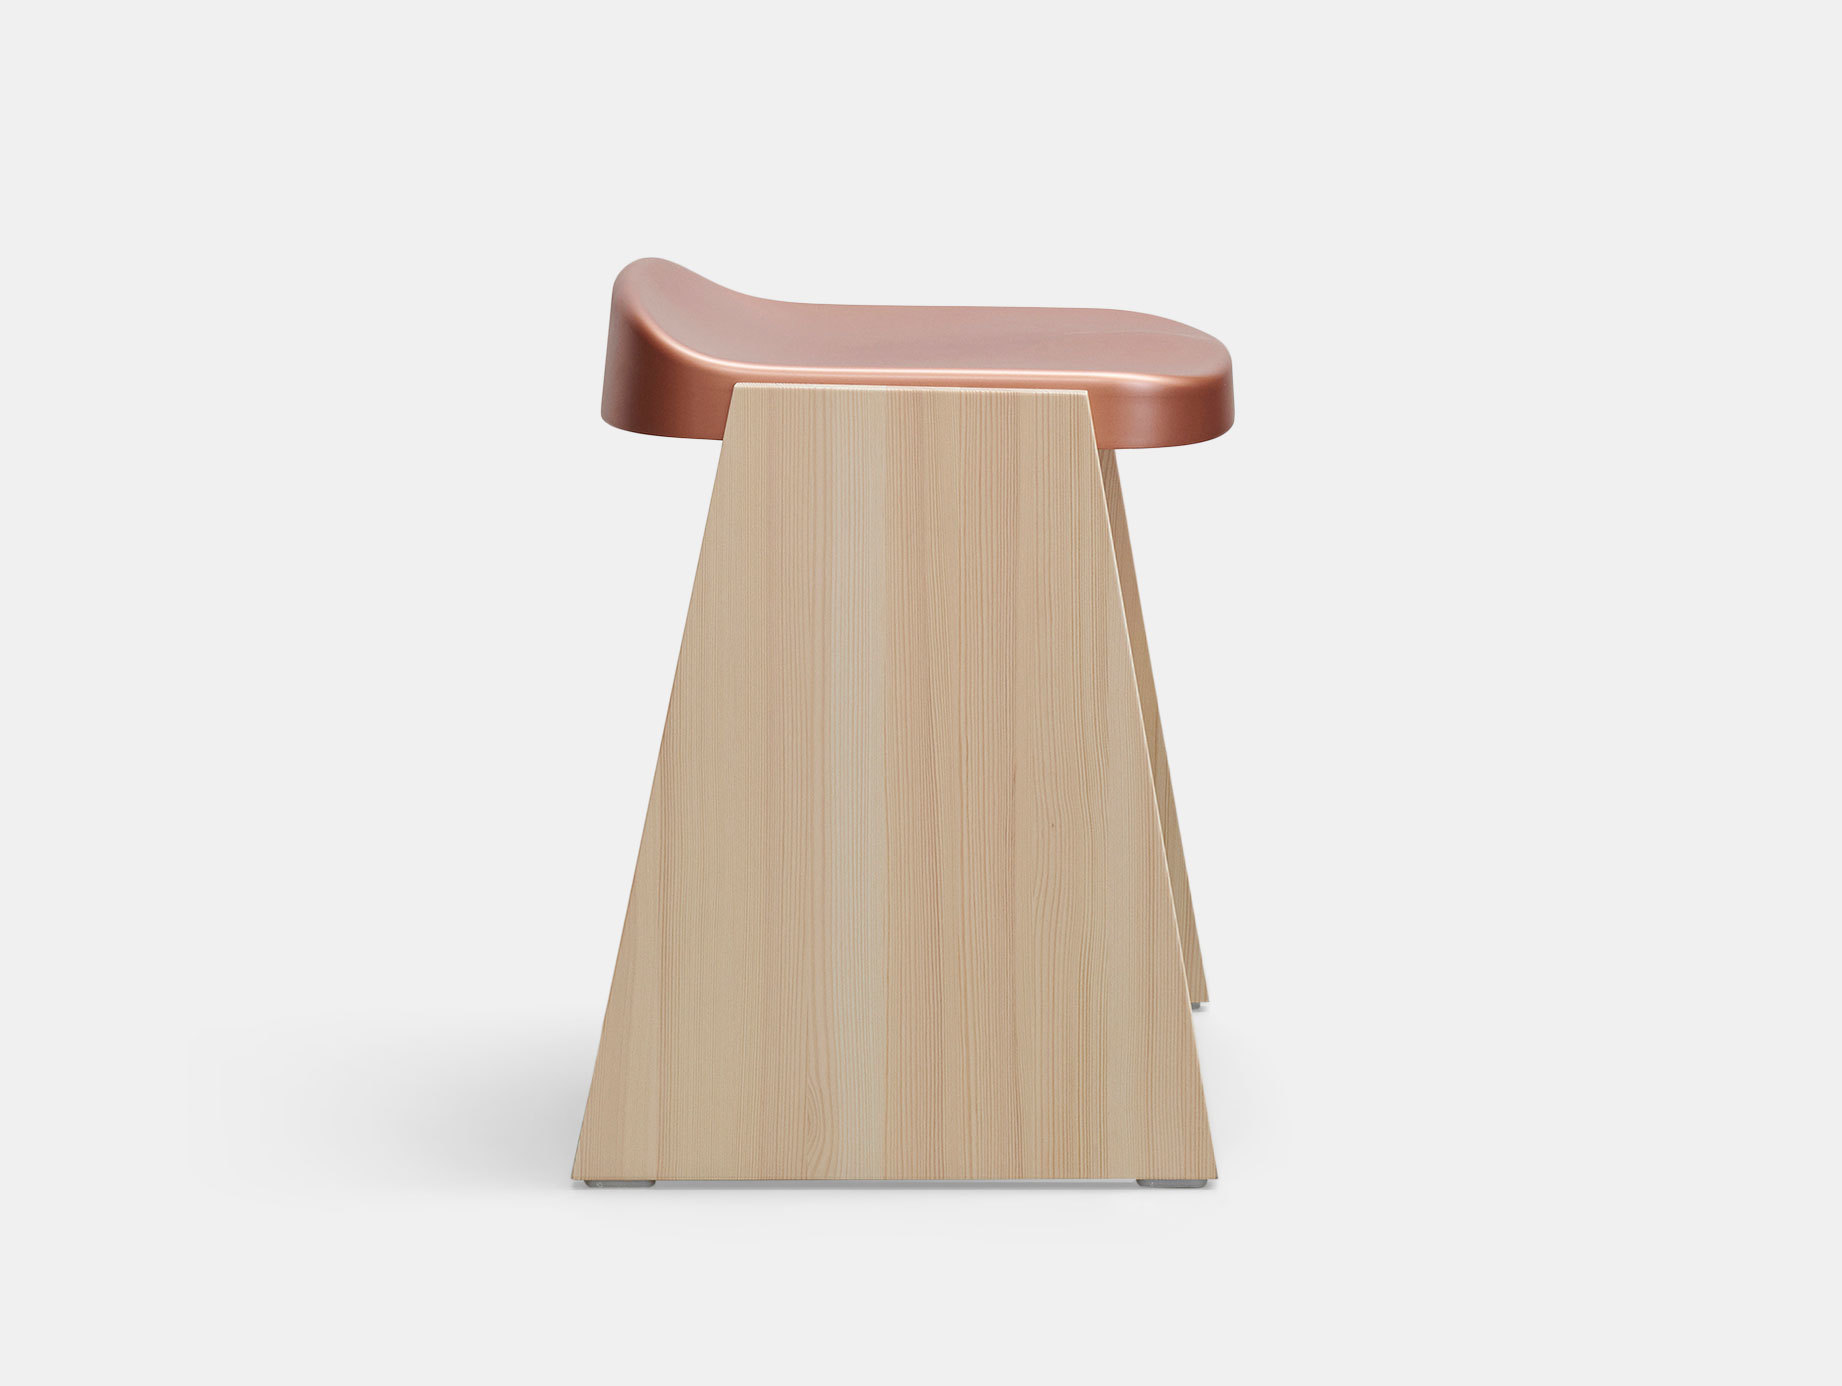 Mattiazzi Fronda Stool Pine Copper Seat Sam Hecht Kim Colin